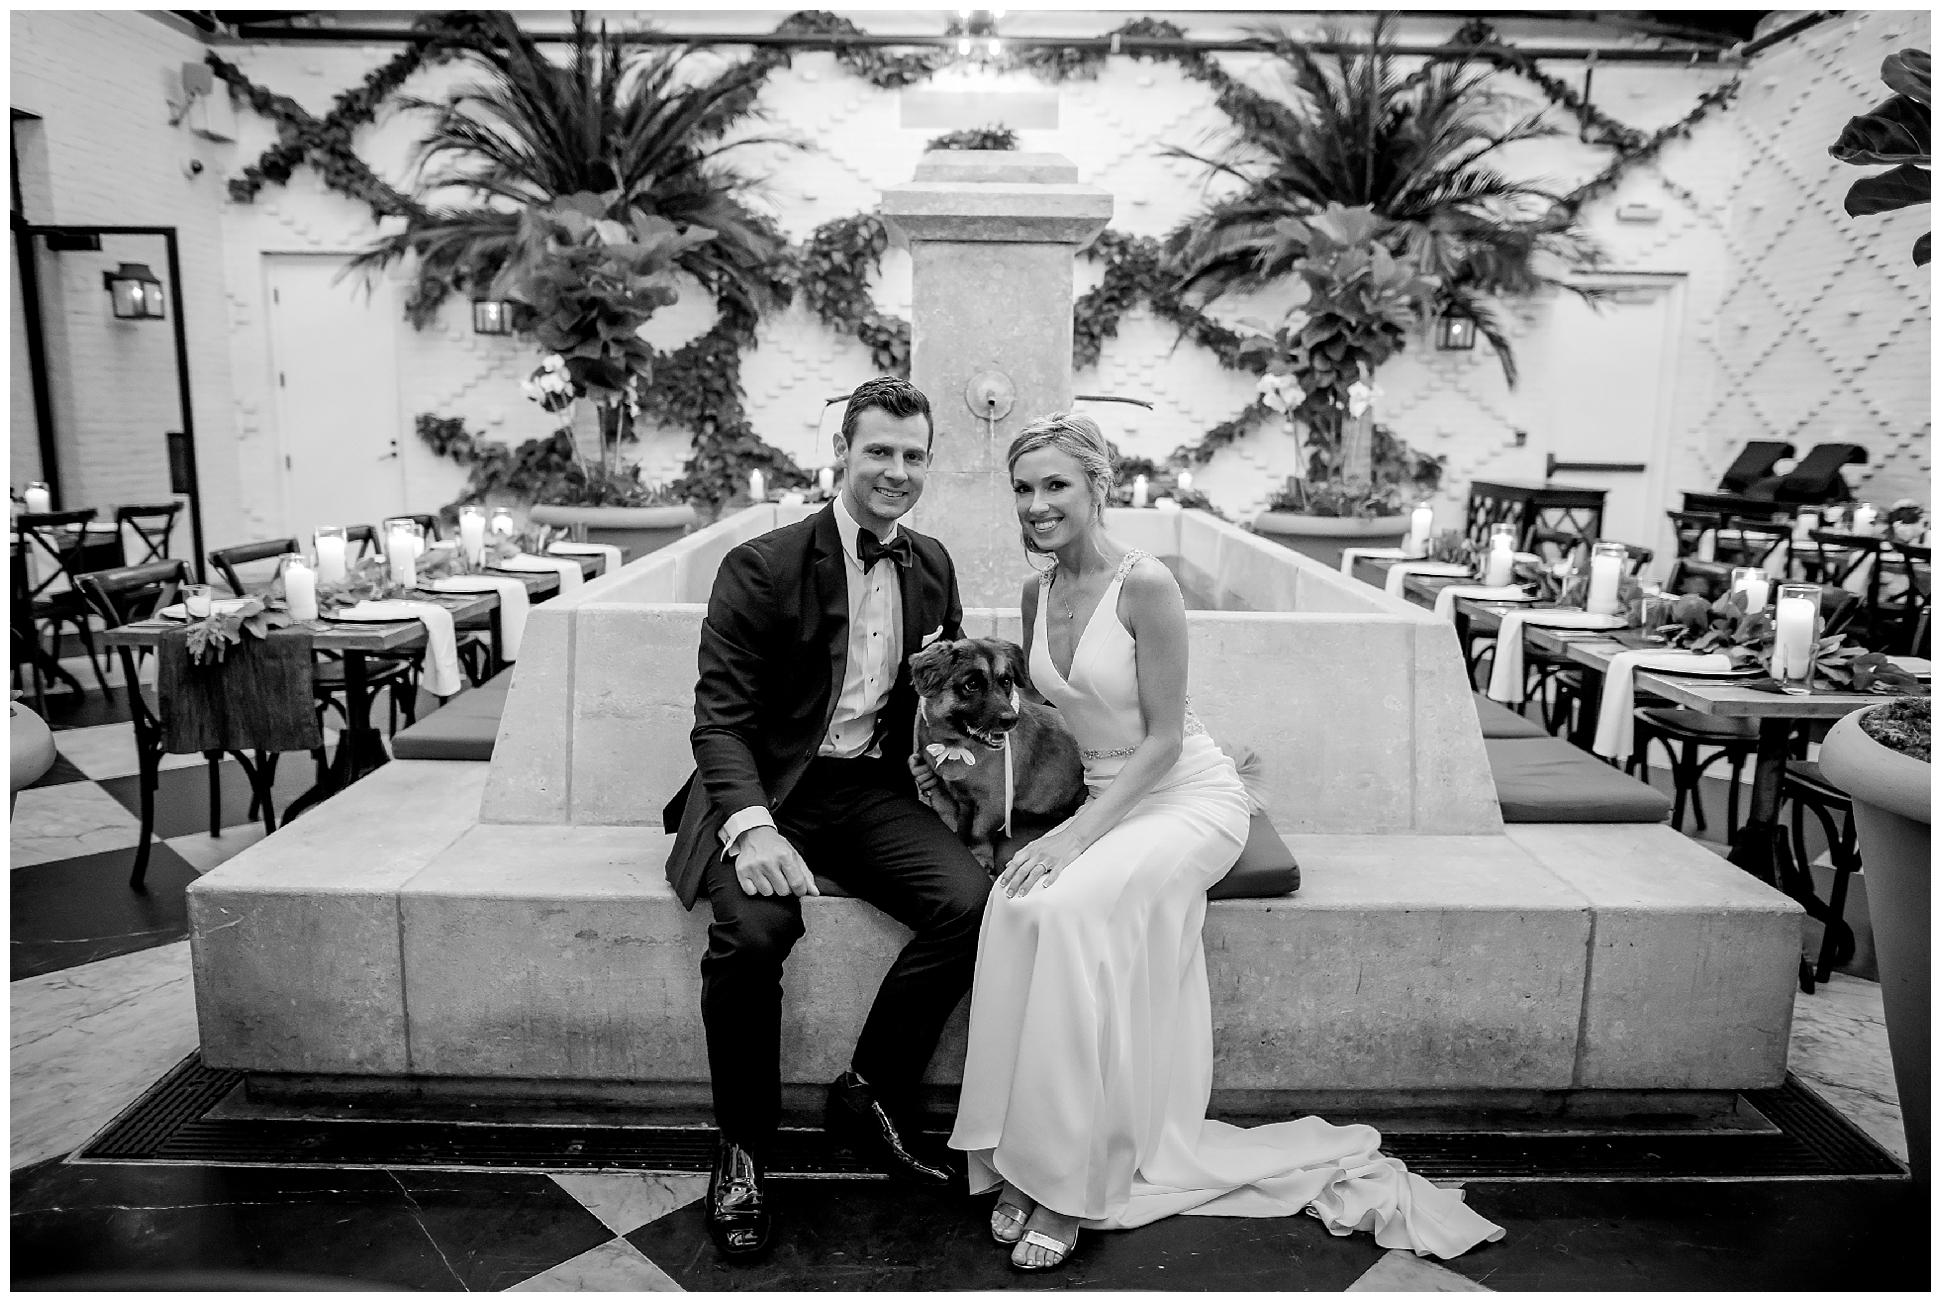 Oxford-exchange-wedding-photogapher-garland-candels-bookstore-burgandy-botanica_0054.jpg